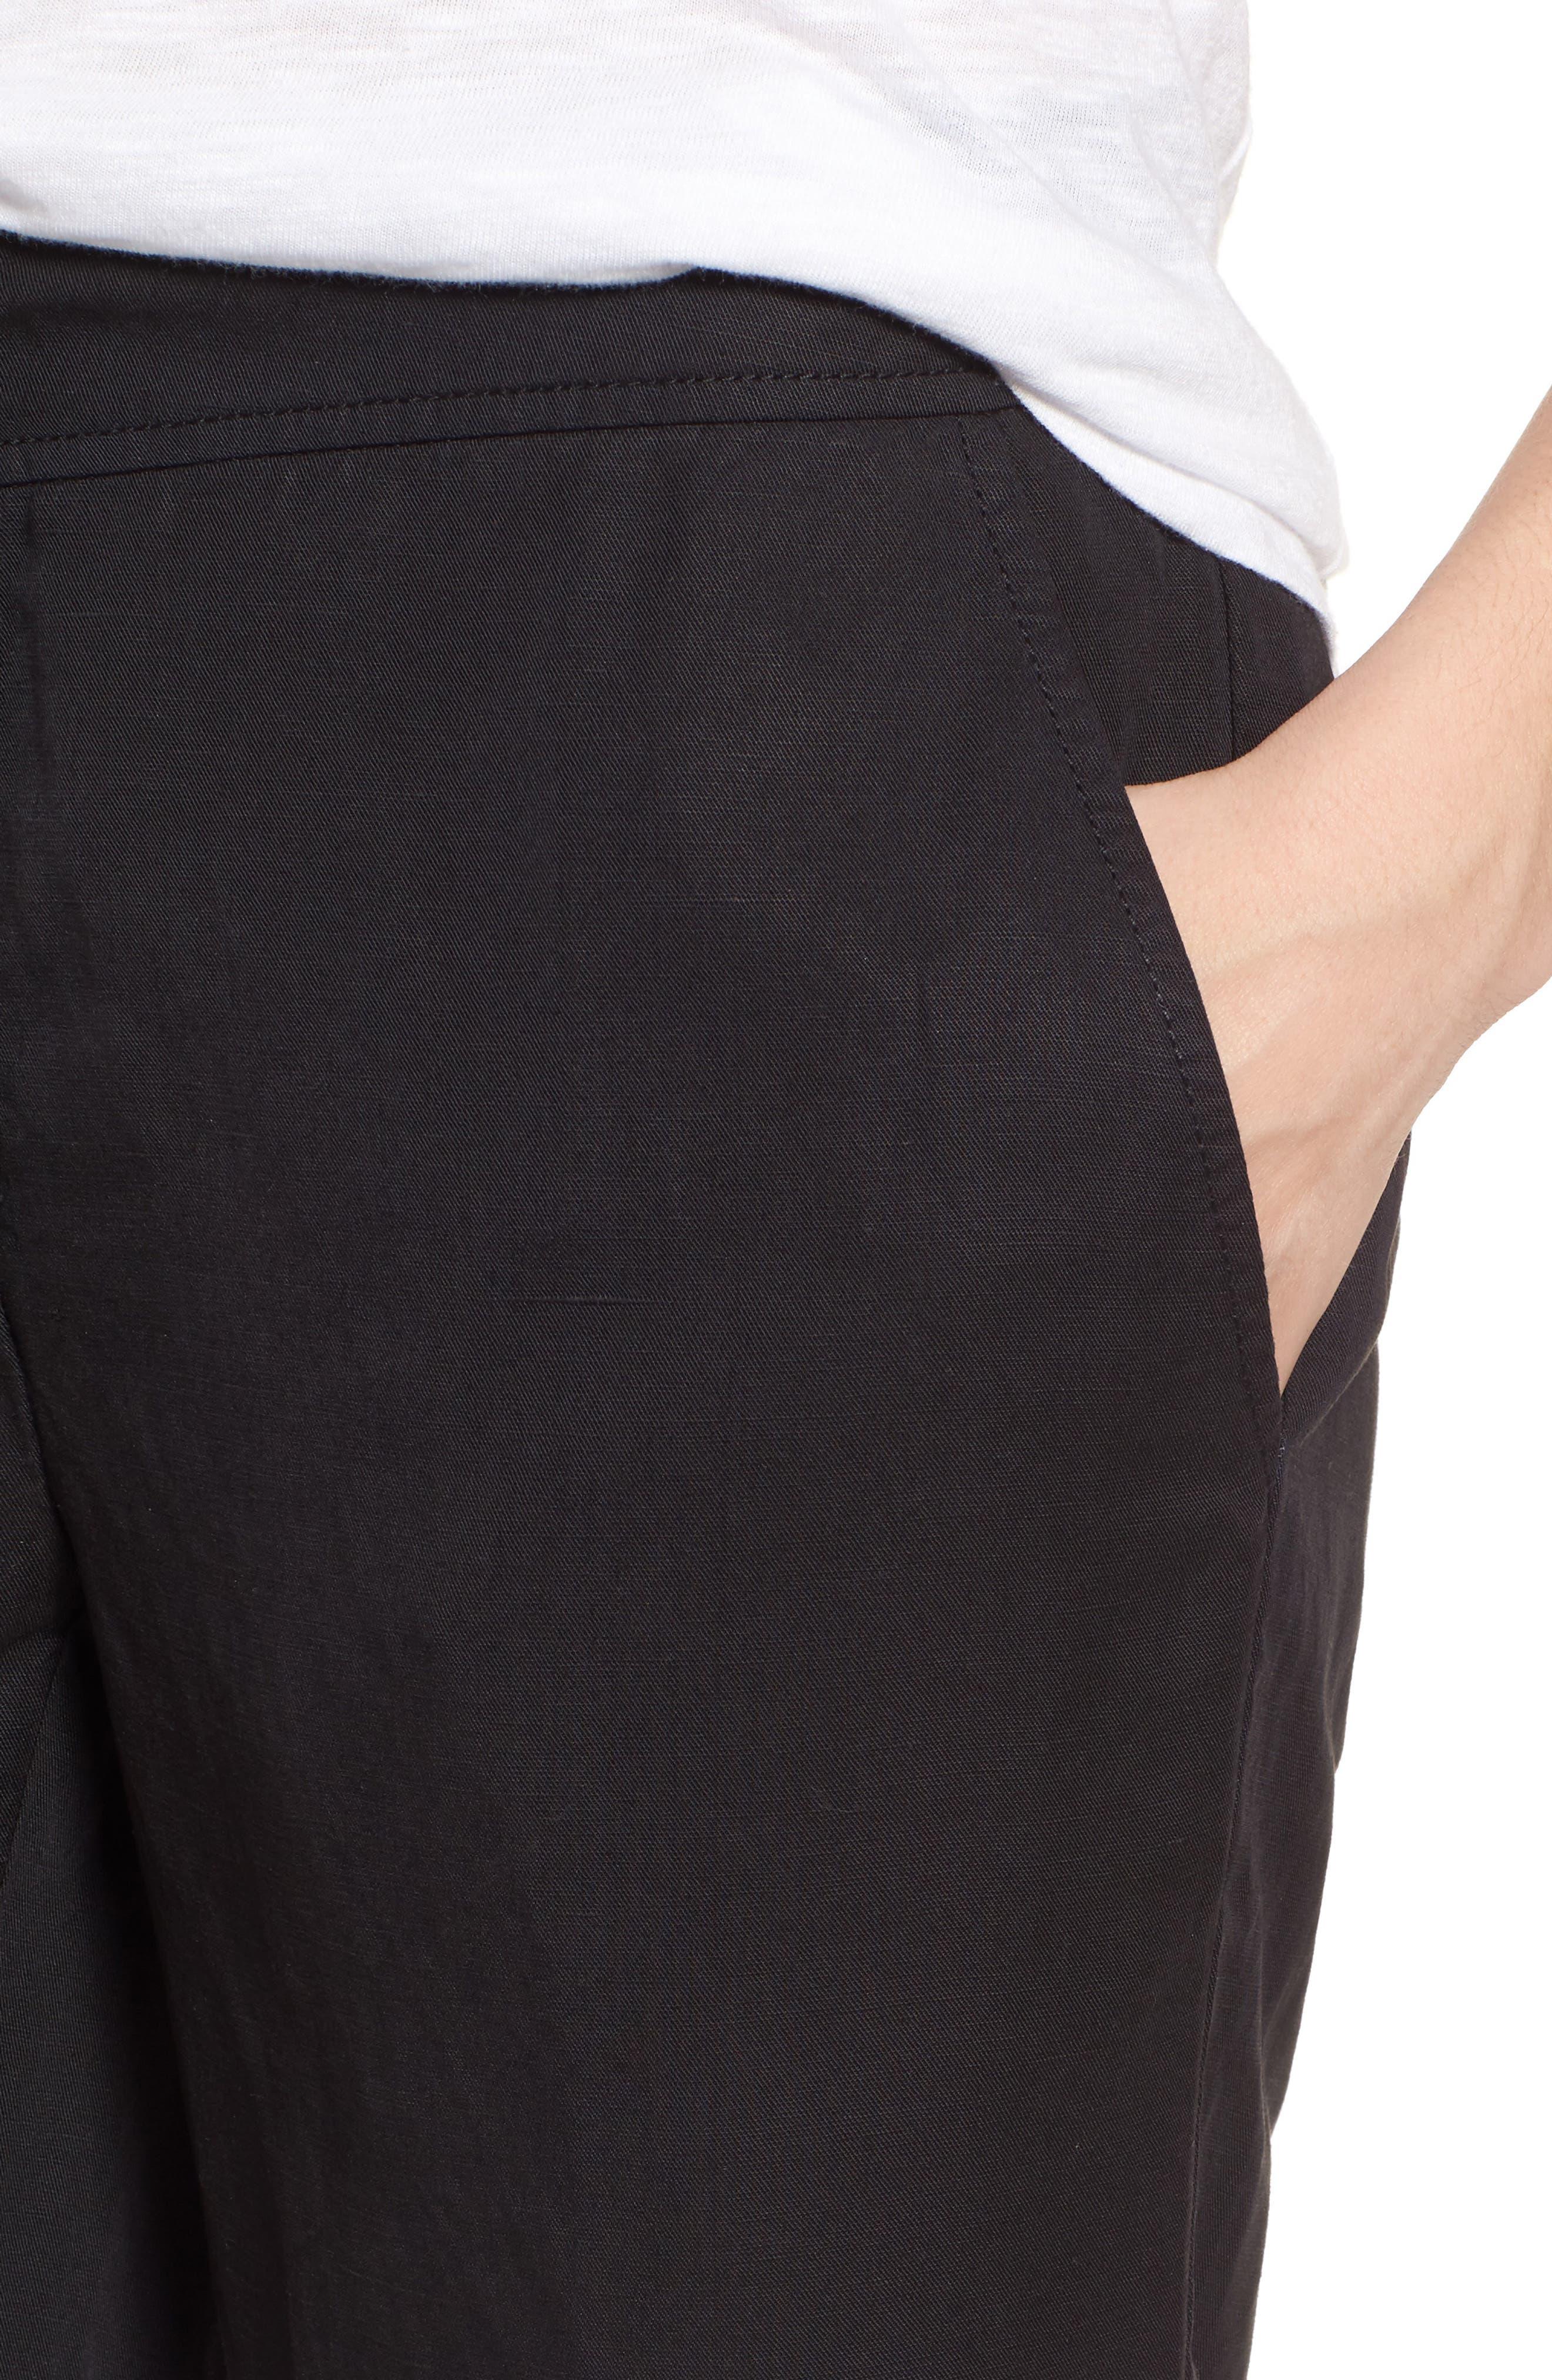 Tencel<sup>®</sup> Lyocell & Linen Walking Shorts,                             Alternate thumbnail 4, color,                             001